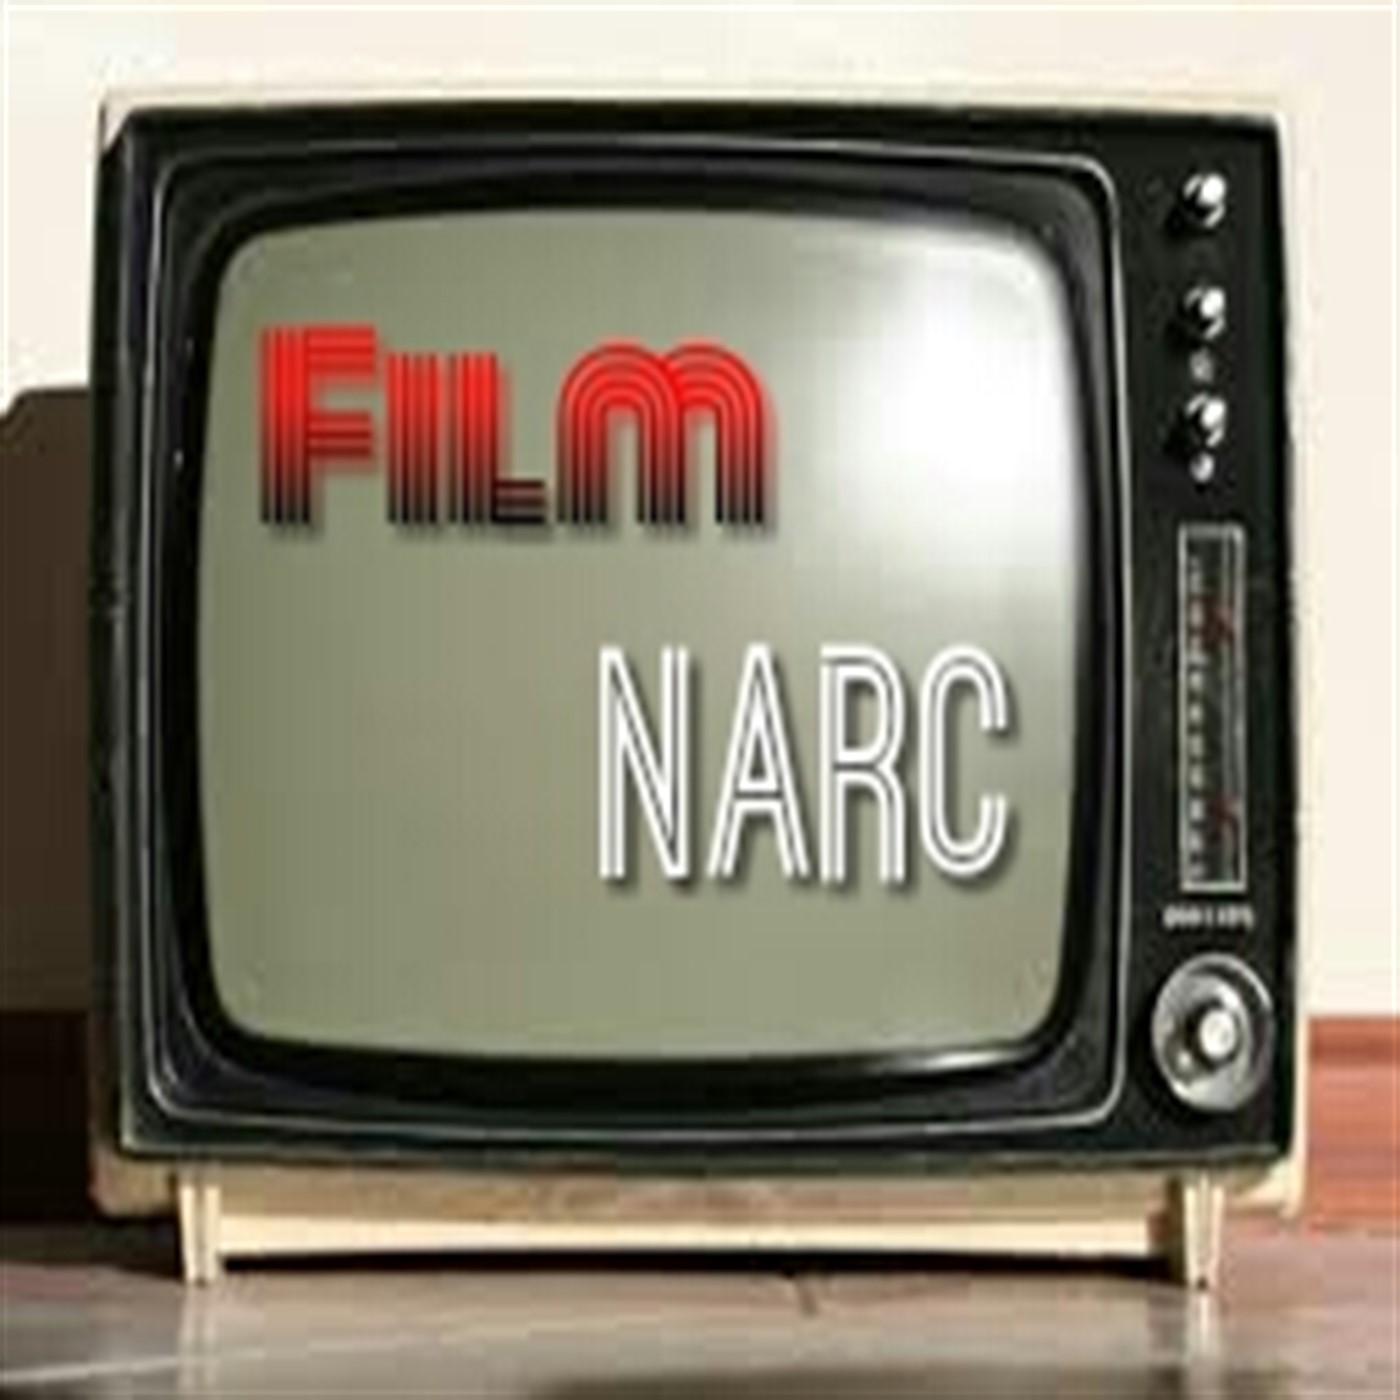 Film Narc